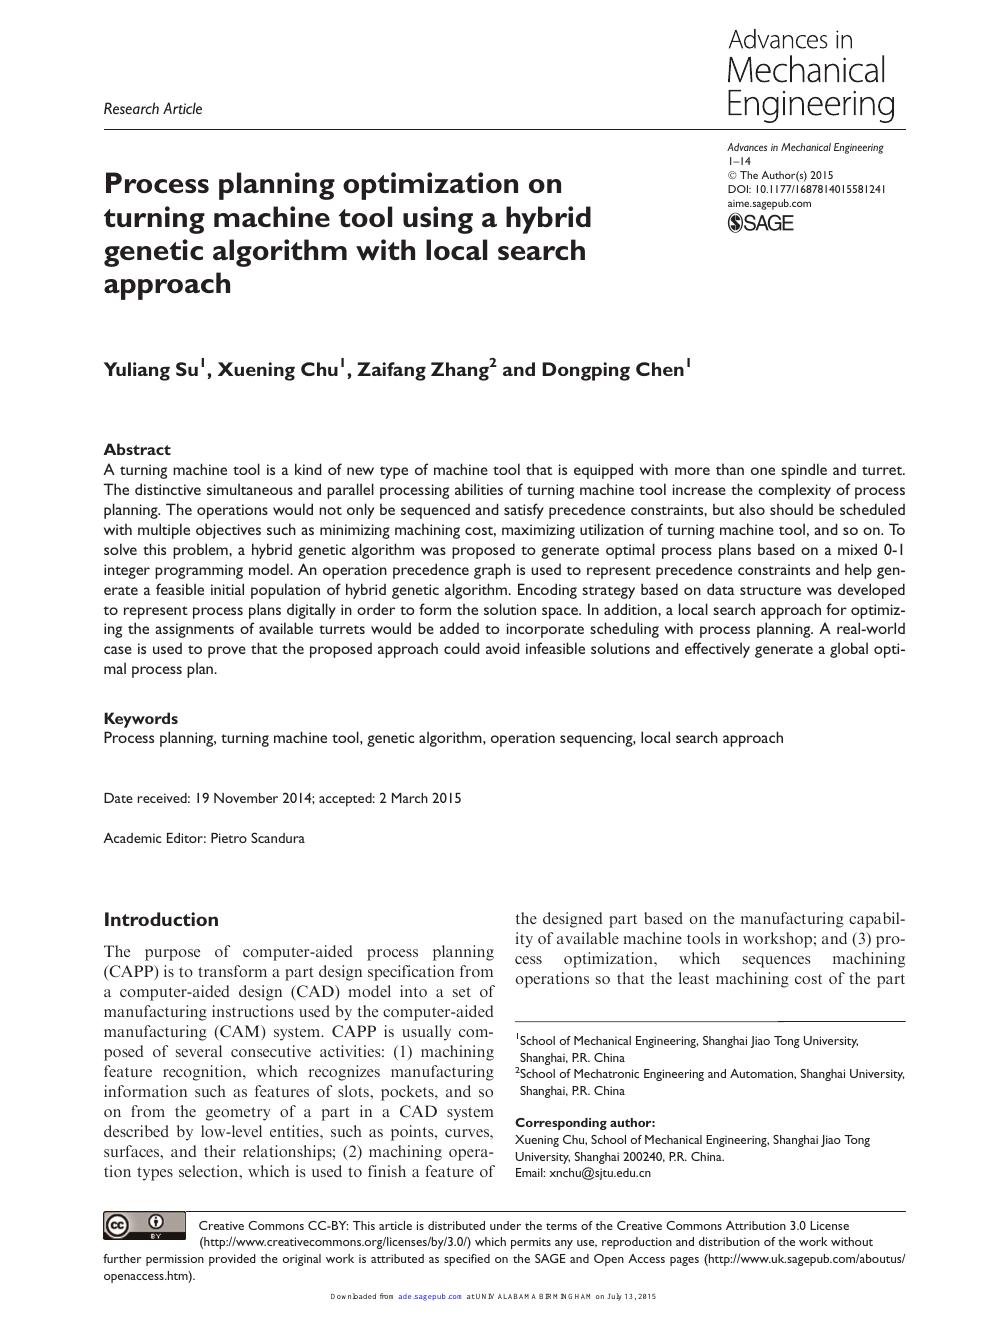 Process planning optimization on turning machine tool using